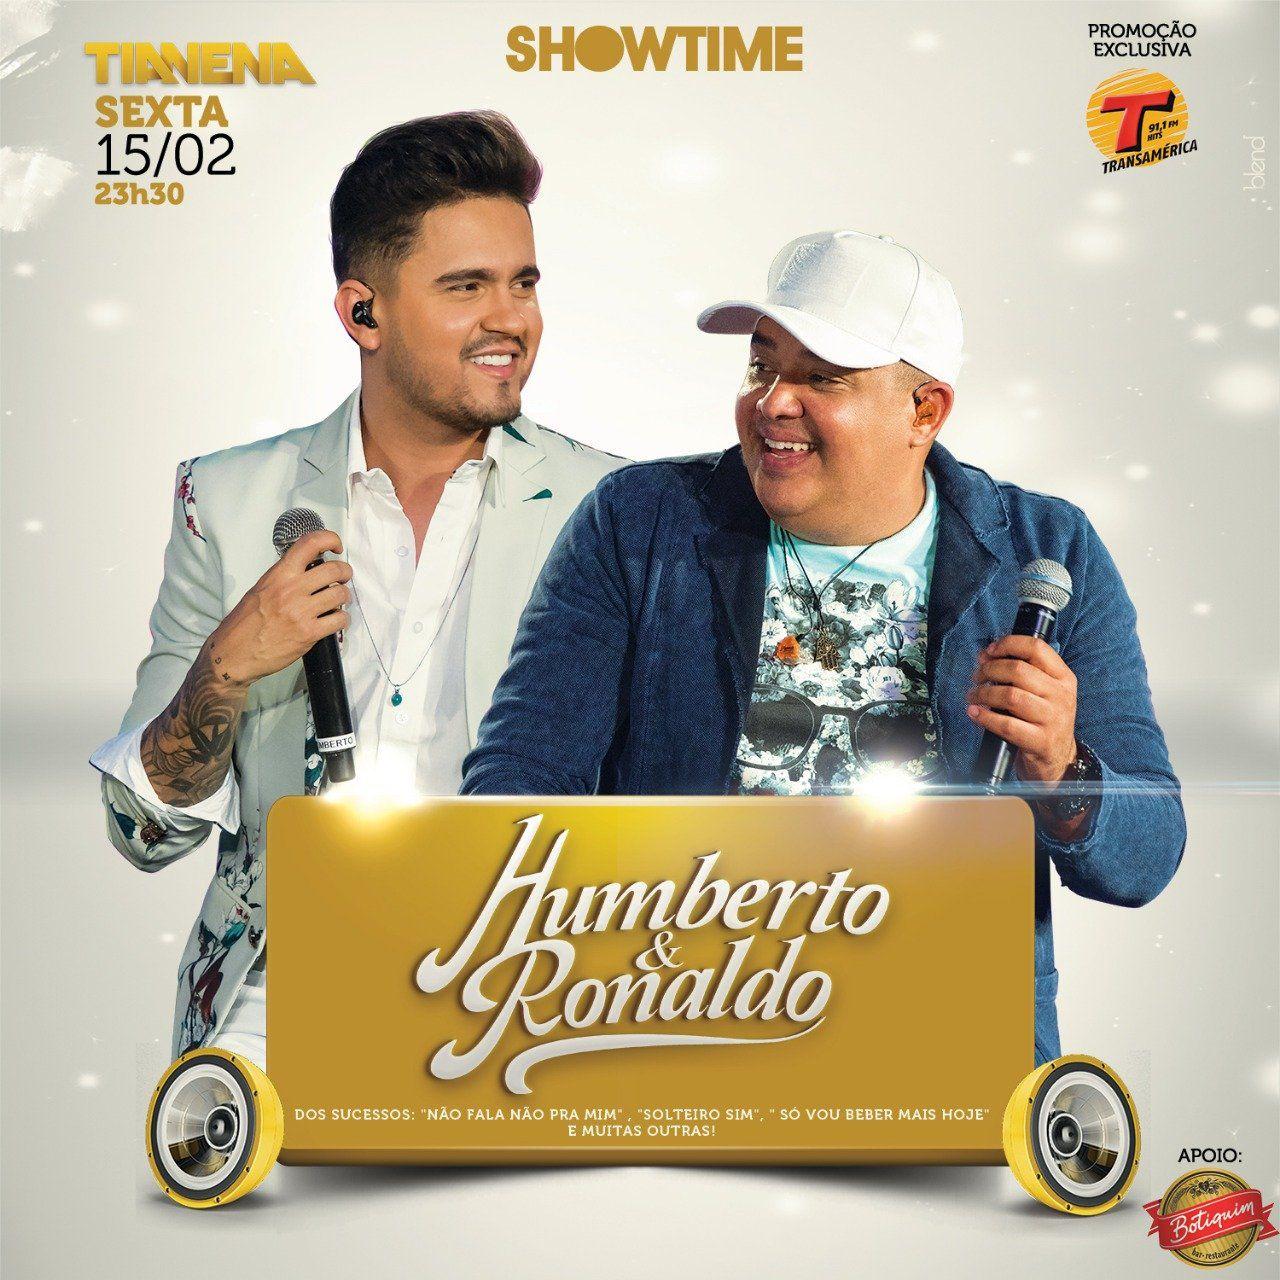 Humberto & Ronaldo - TiaNena - 15/02/19 - Mogi Guaçu - SP